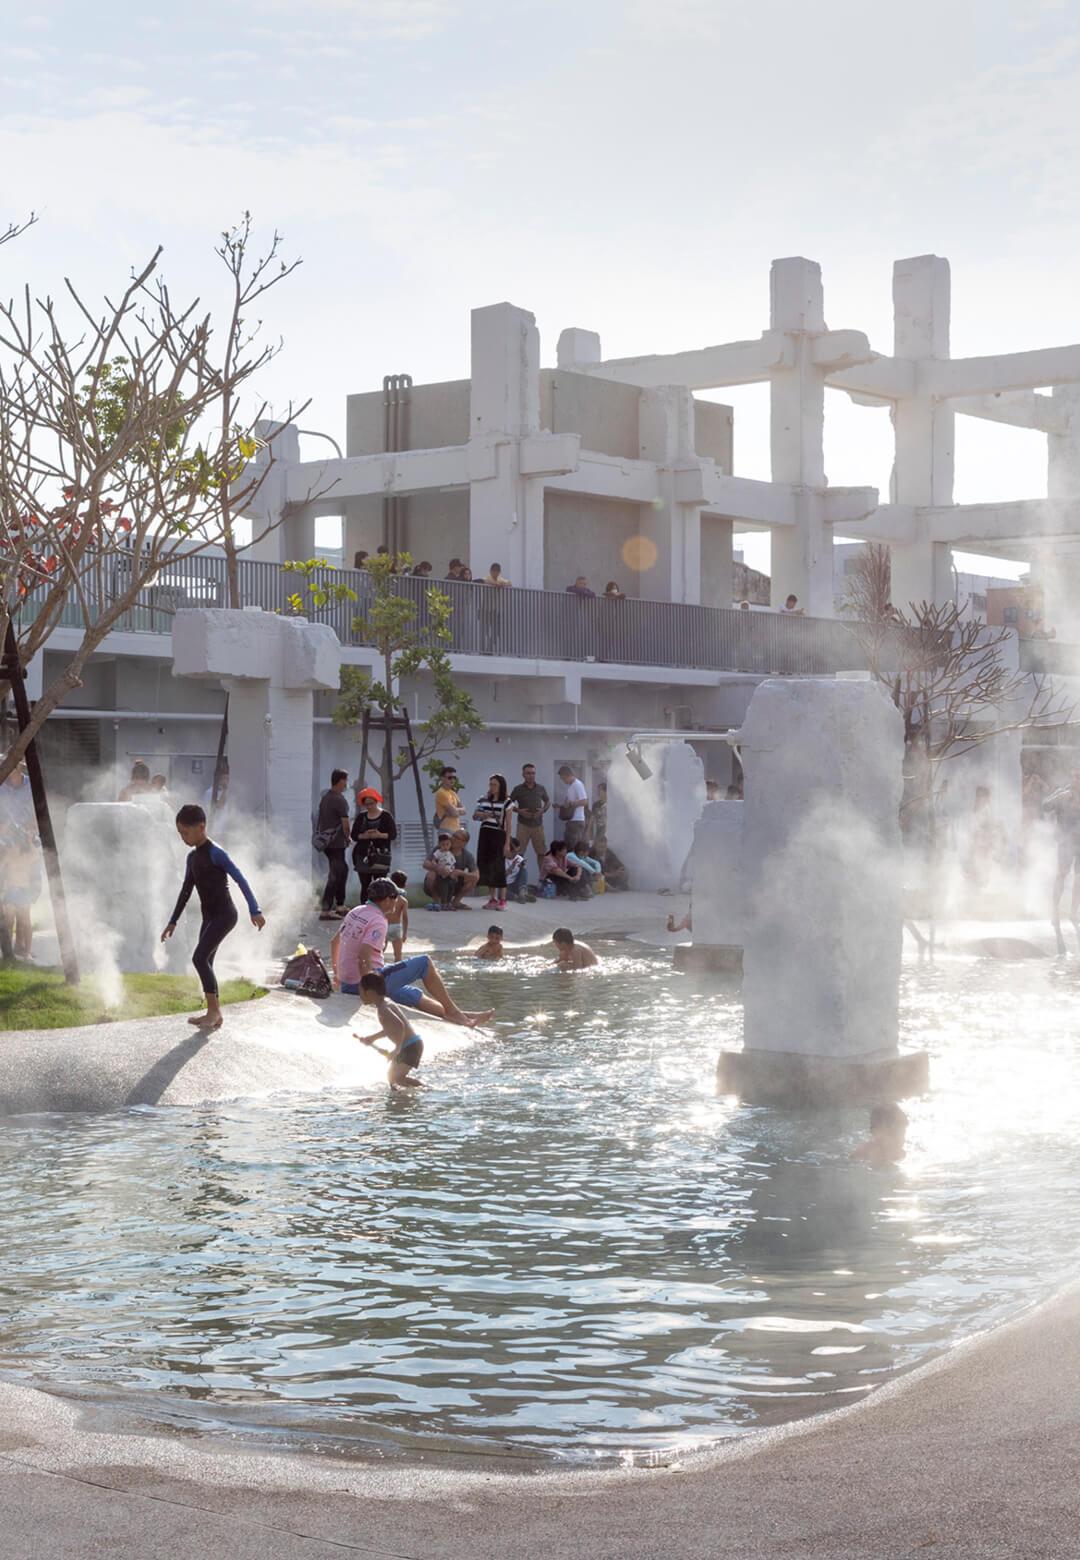 MVRDV's Tainan Spring envisions an 'urban lagoon' for the city of Tainan in Taiwan | MVRDV's Tainan Spring is an urban lagoon in Tainan, Taiwan | STIRworld